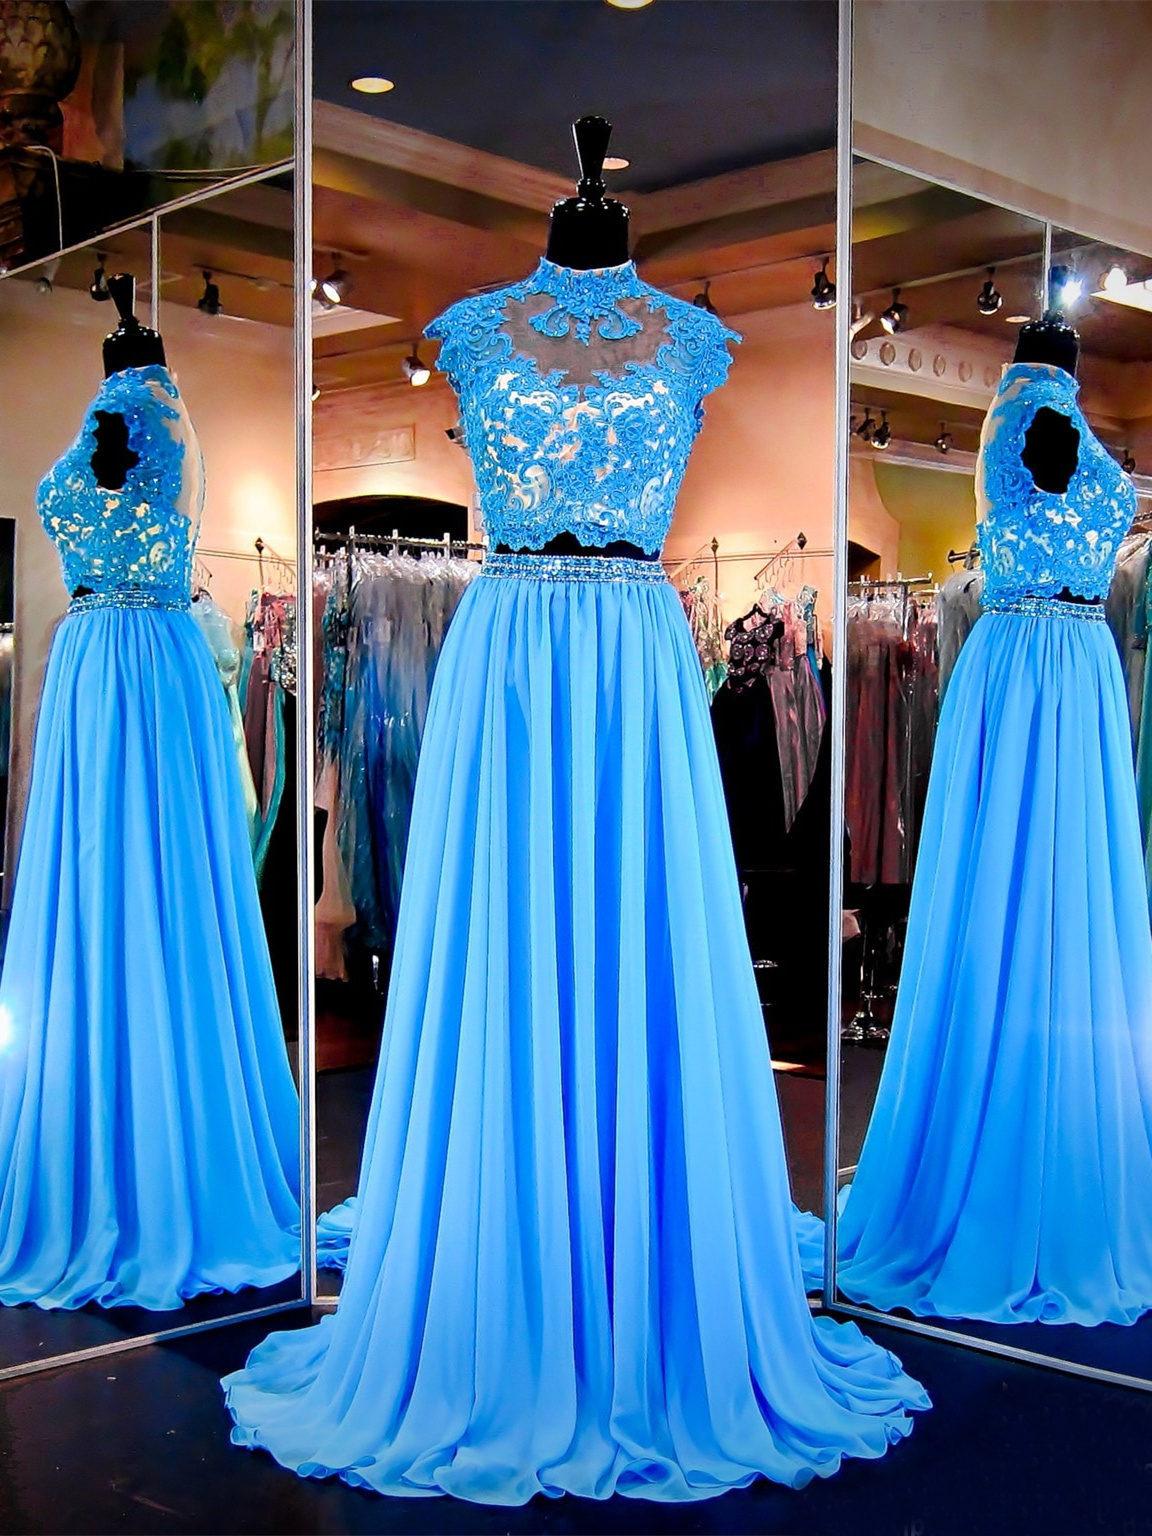 Perfekt Abendkleid Lang Blau Spezialgebiet15 Wunderbar Abendkleid Lang Blau Spezialgebiet